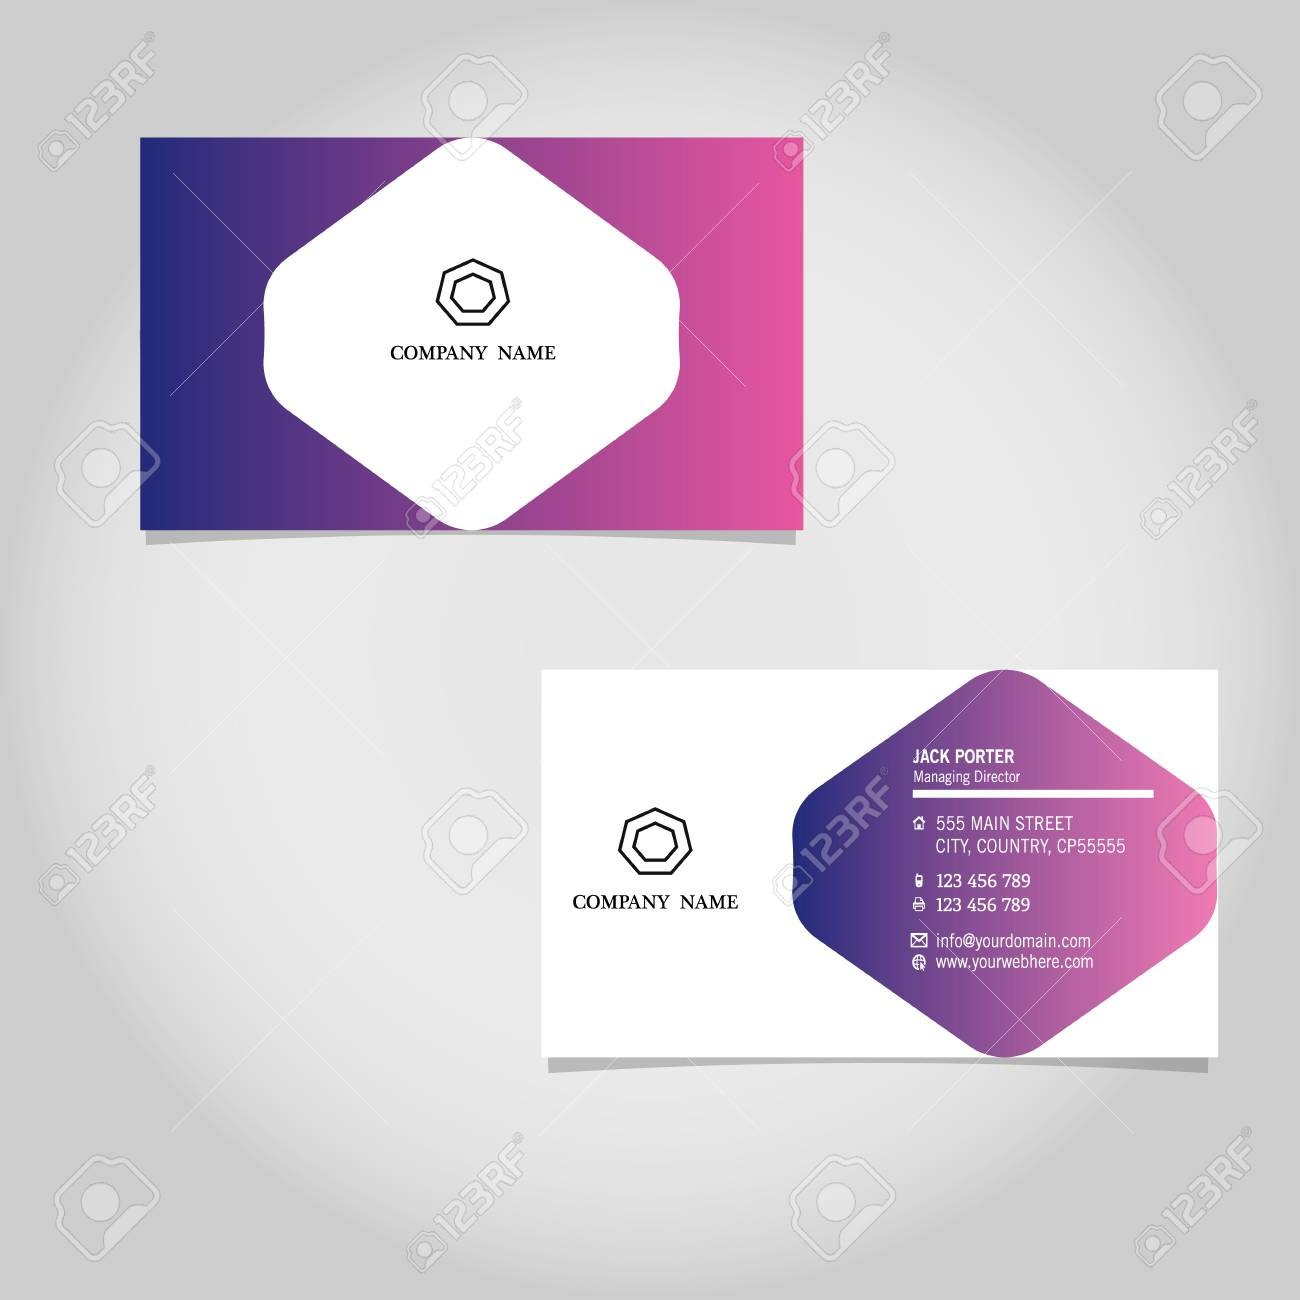 Vector Business Card Template Design Adobe Illustrator For Adobe Illustrator Business Card Template